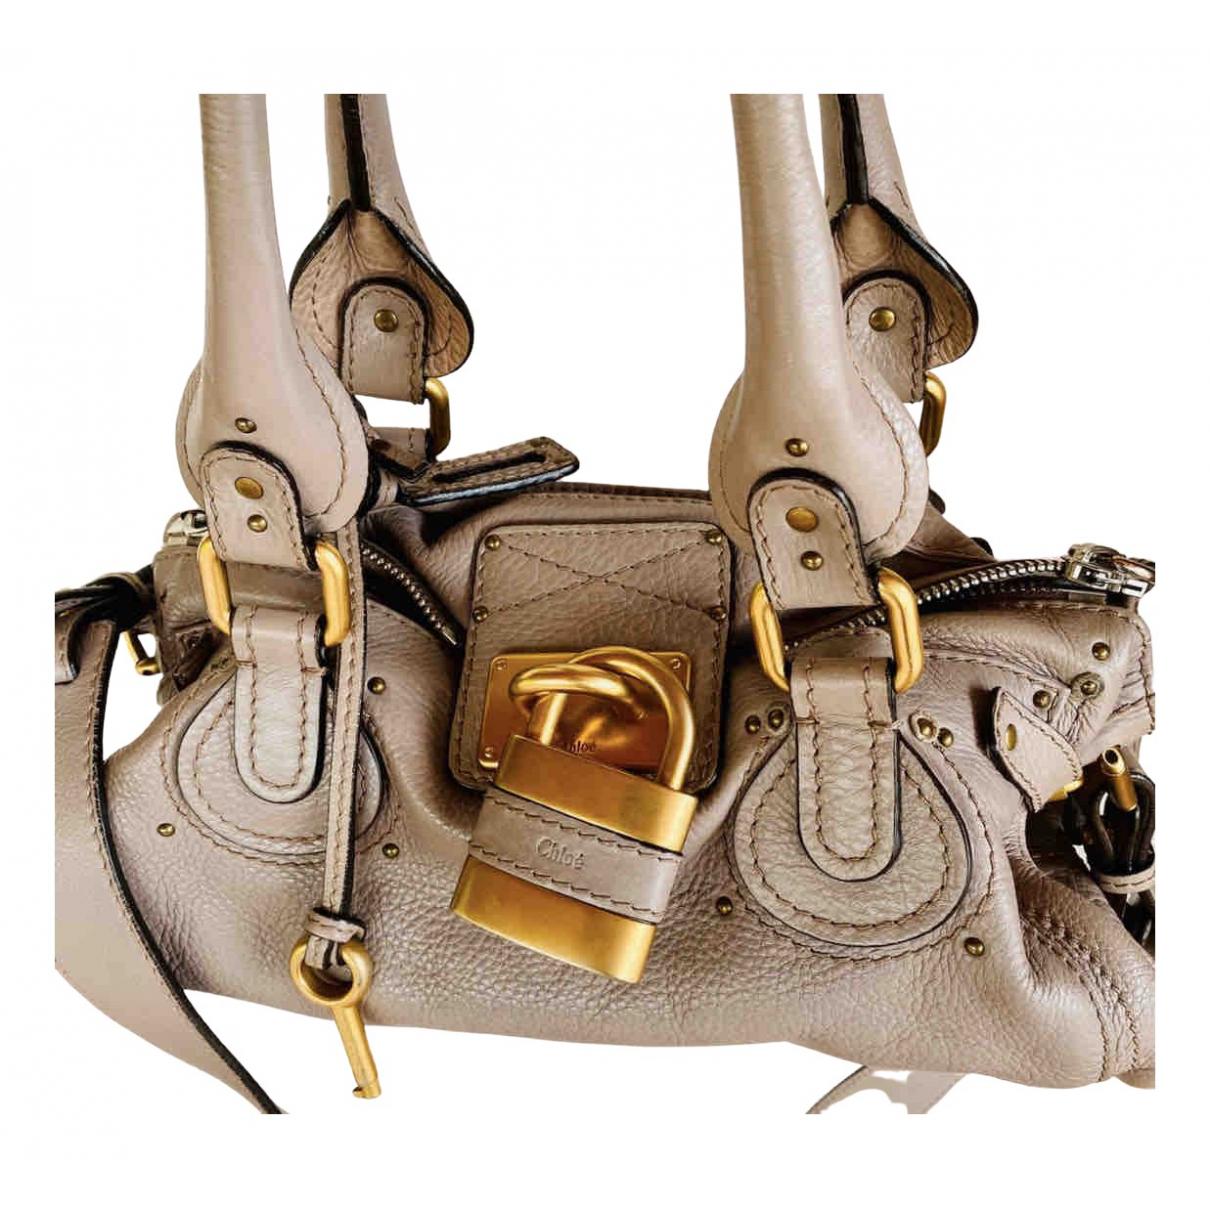 Chloé Paddington Leather handbag for Women N